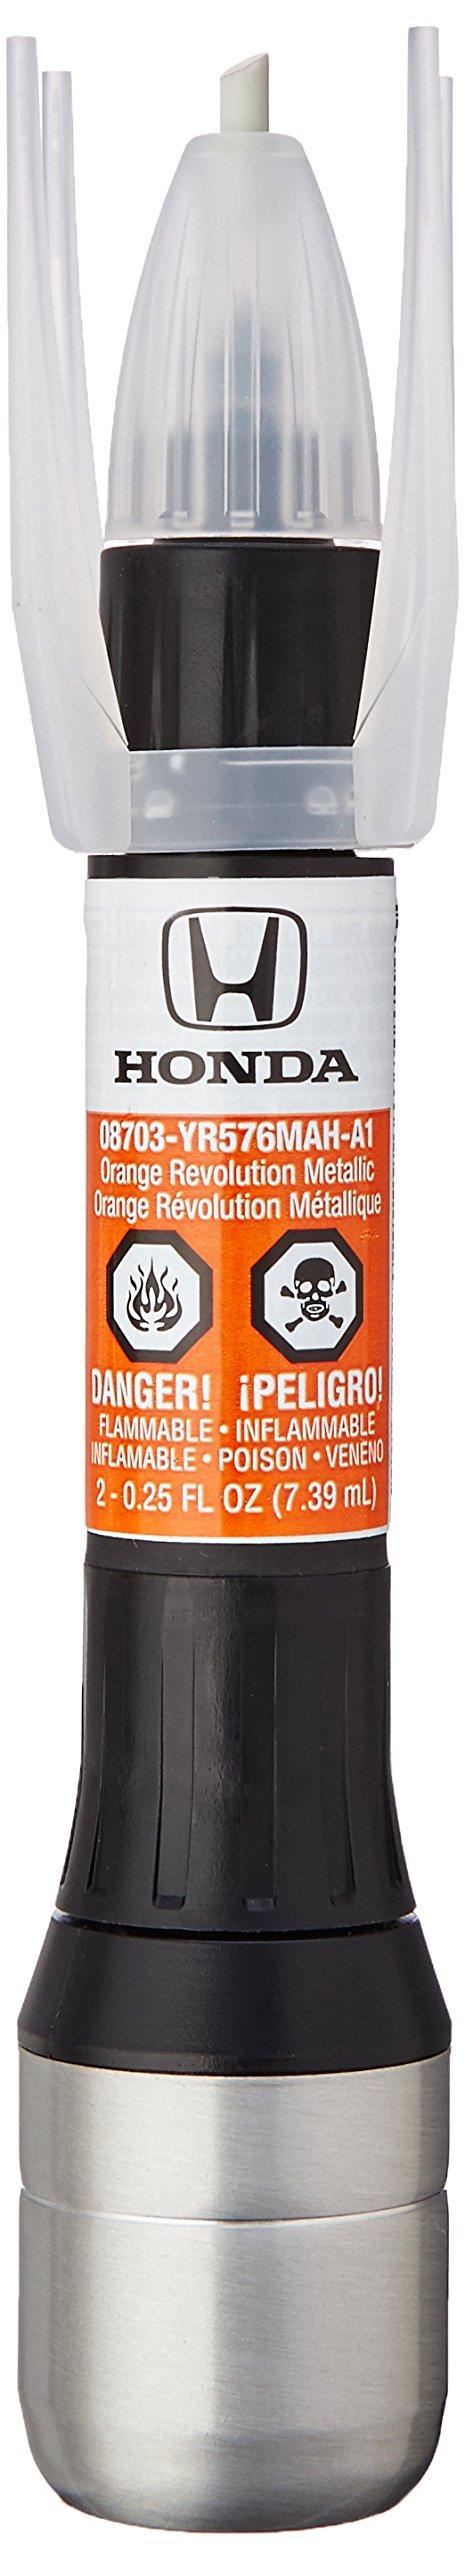 Genuine Honda (08703-YR576MAH-PN) Touch-Up Paint, New Brilliant Orange Metallic, Color Code: YR576M